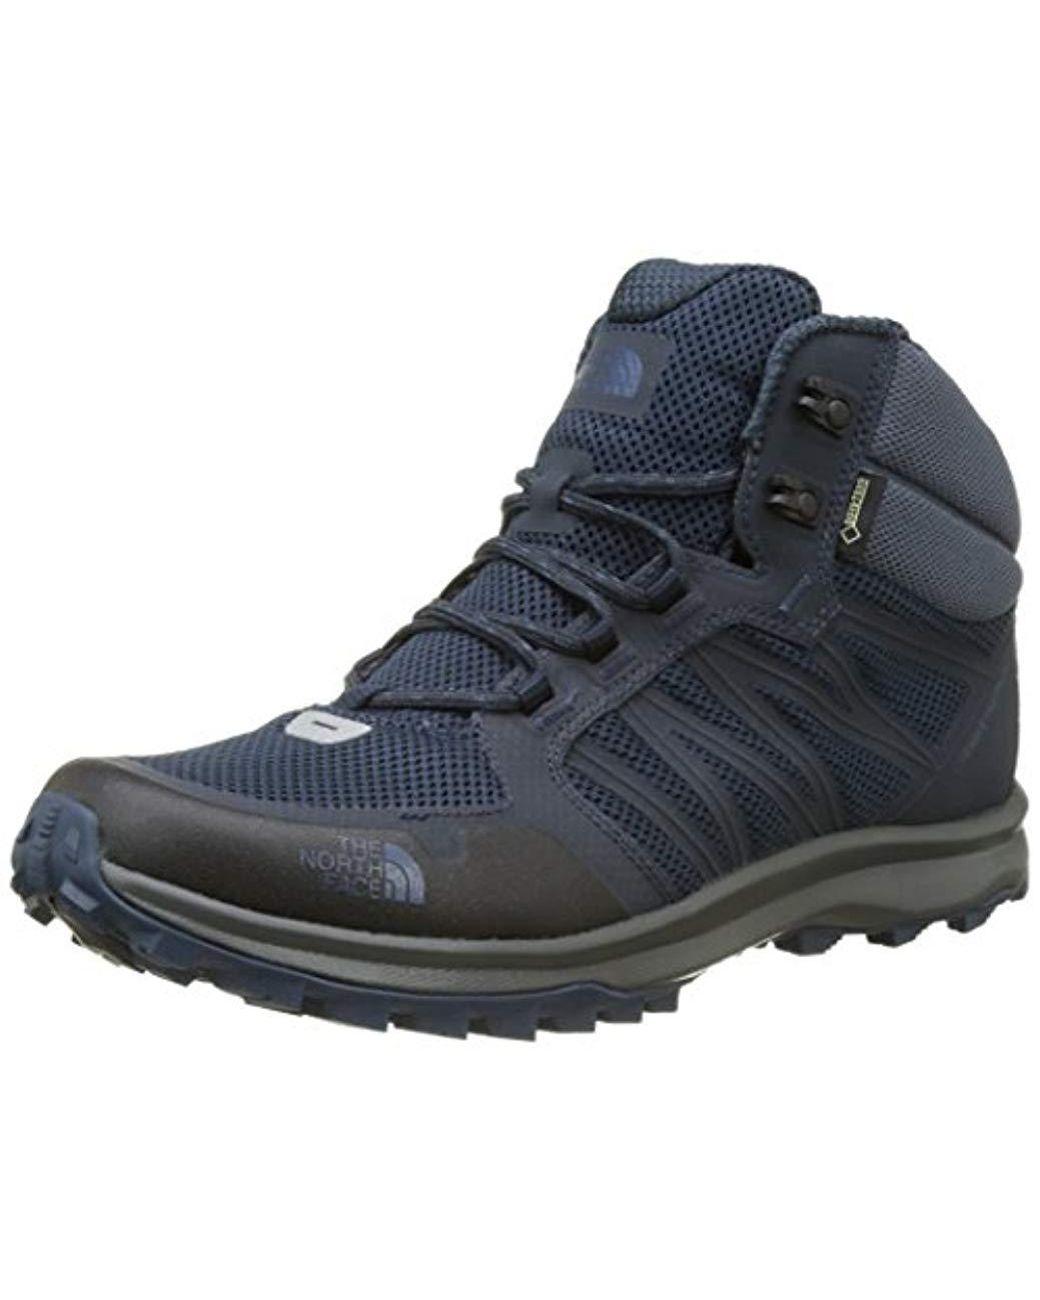 fd8d9c1c1 Men's Blue Litewave Fastpack Mid Gore-tex High Rise Hiking Boots